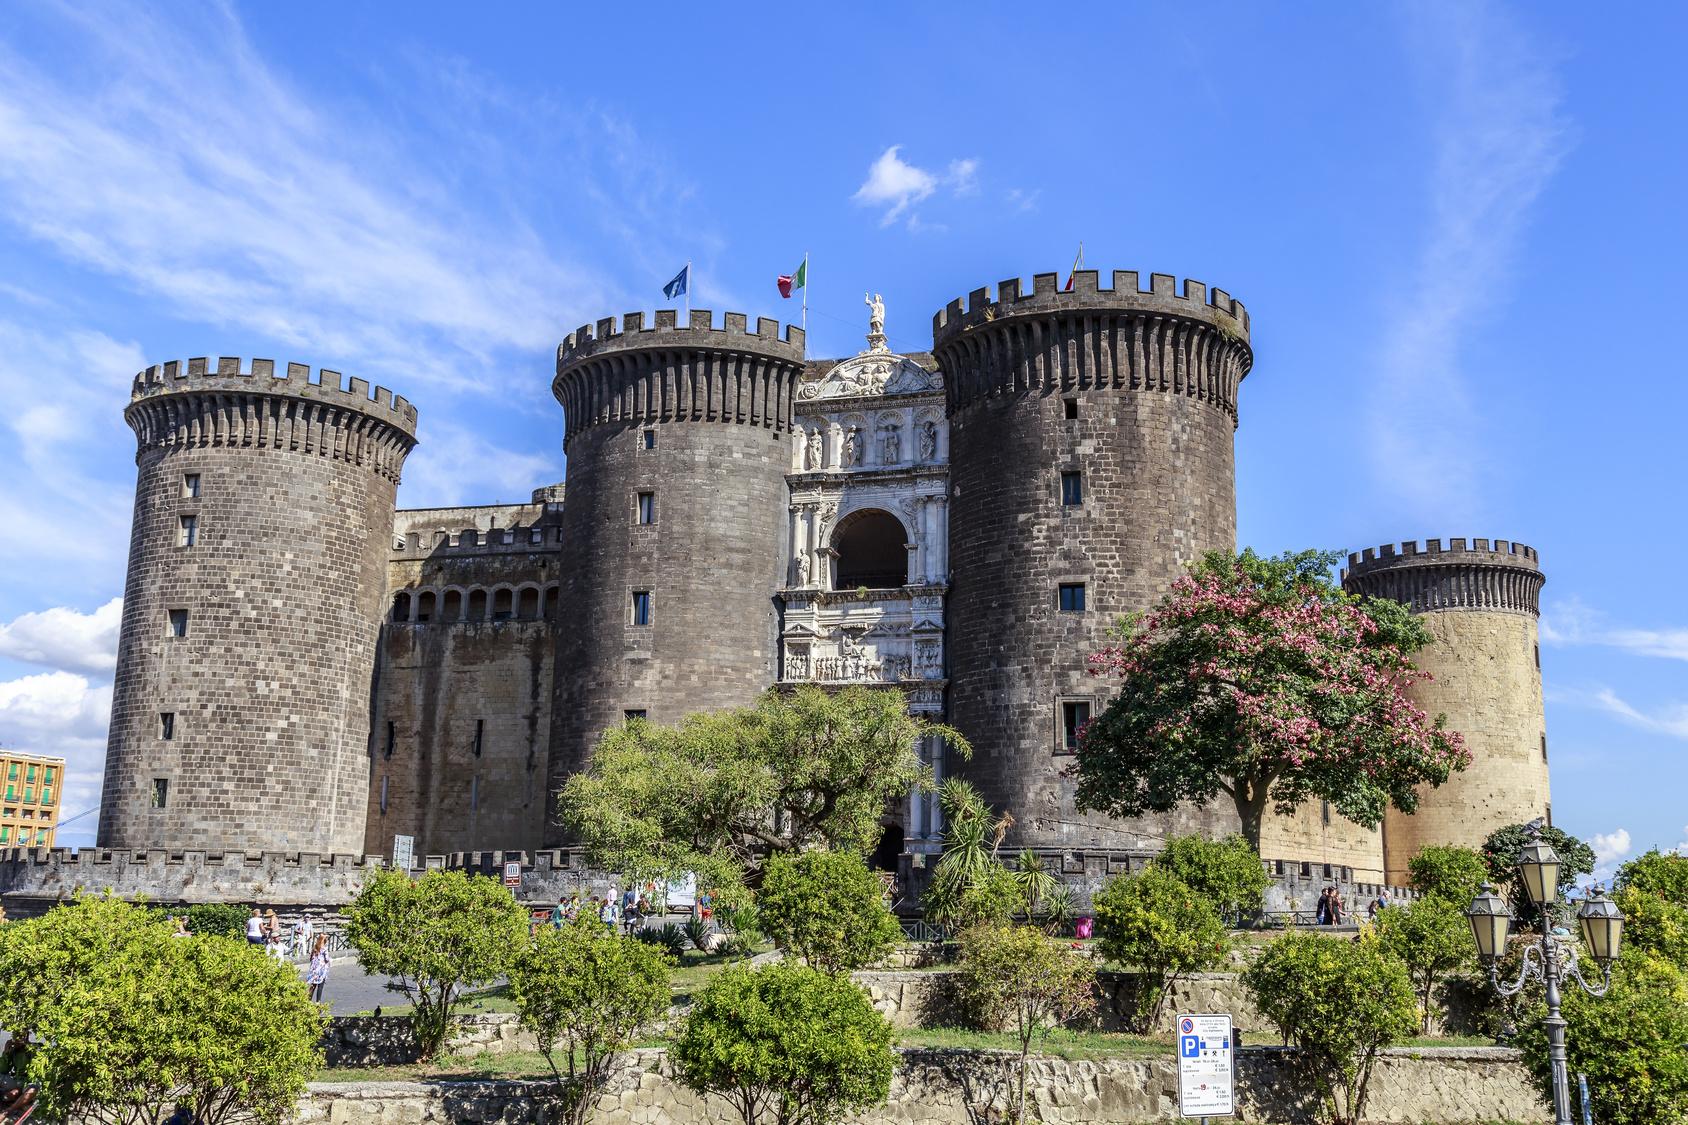 Maschio Angioino, Naples